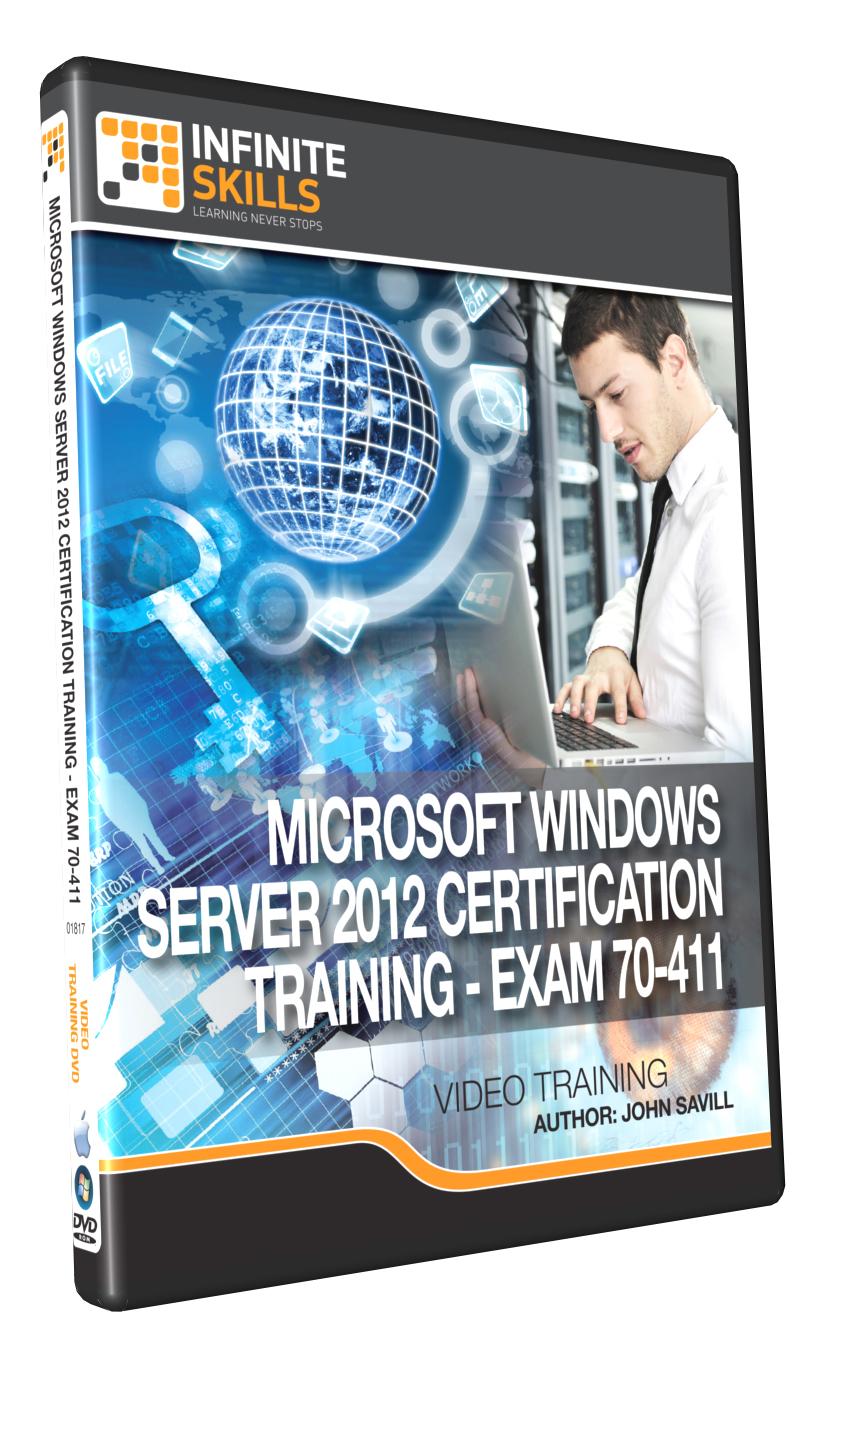 Infinite Skills Microsoft Windows Server 2012 Certification Exam